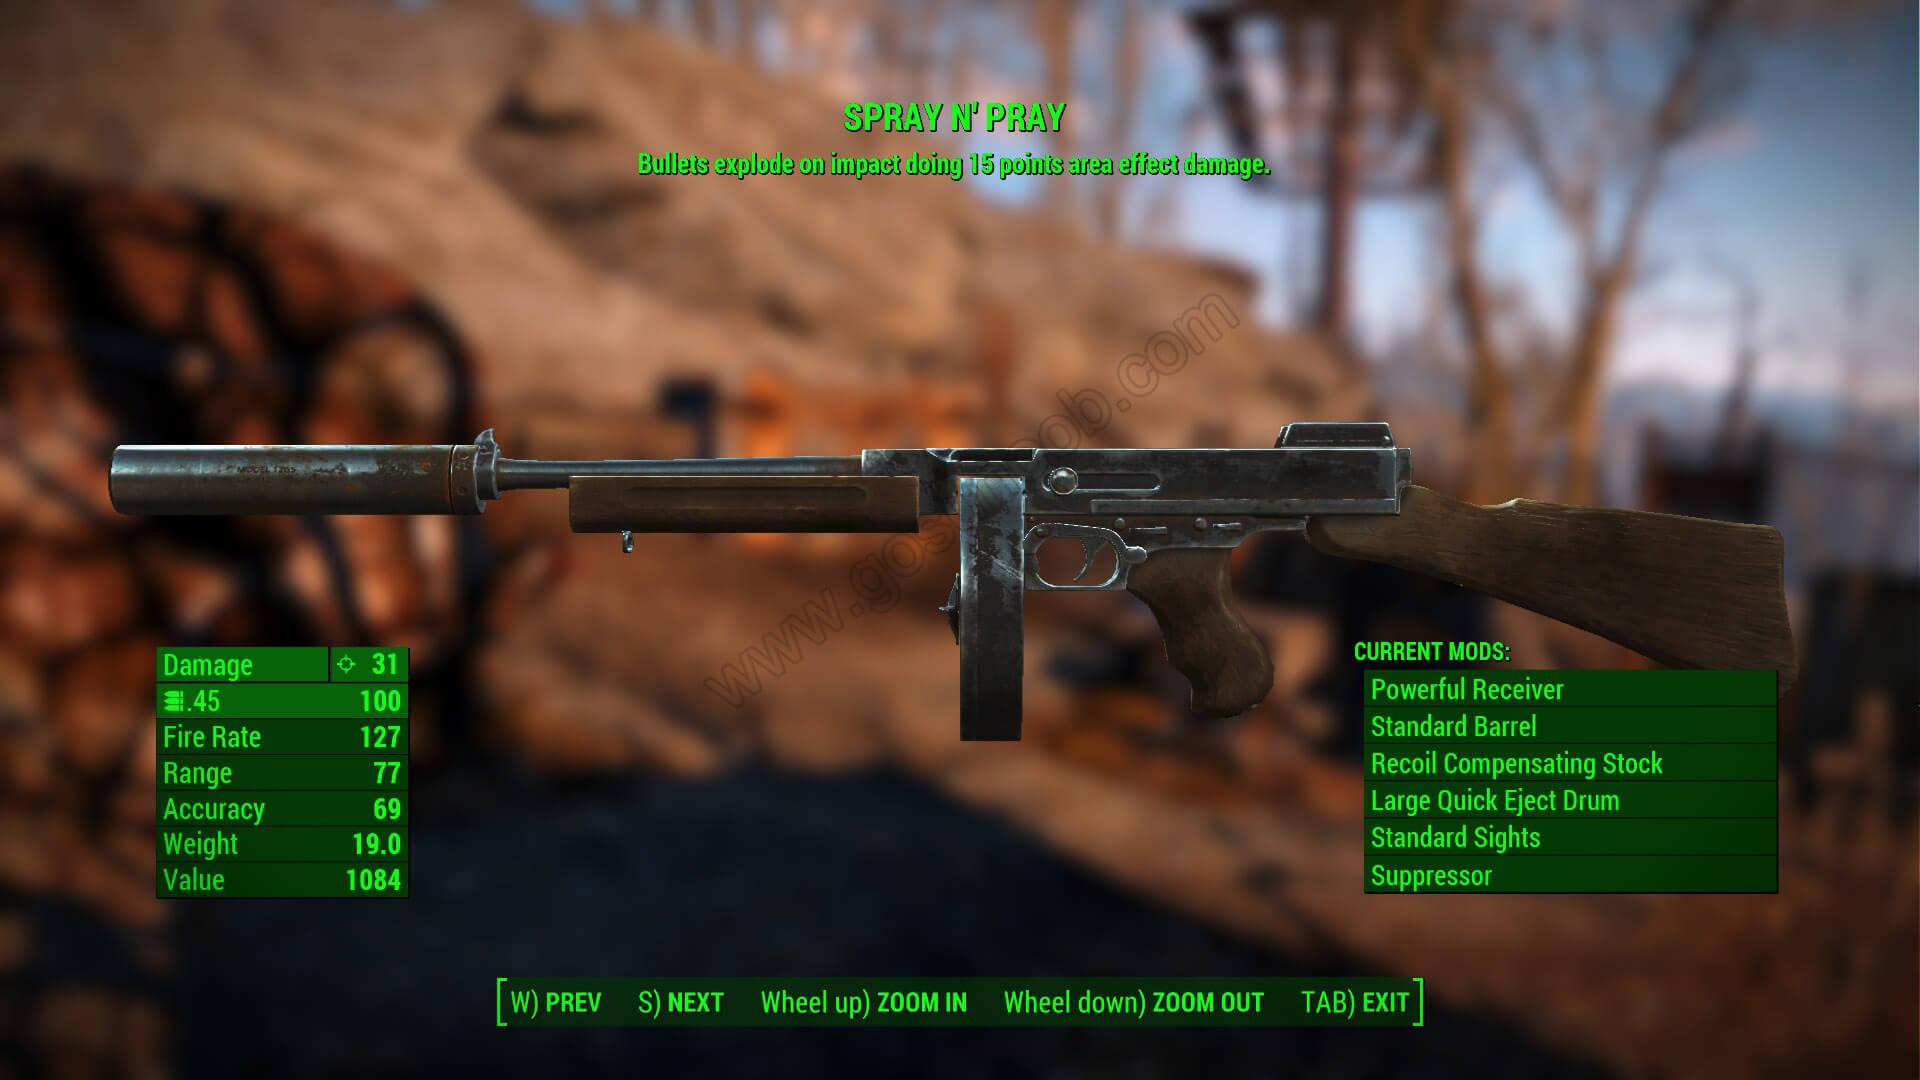 Dart gun - the fallout wiki - fallout: new vegas and more